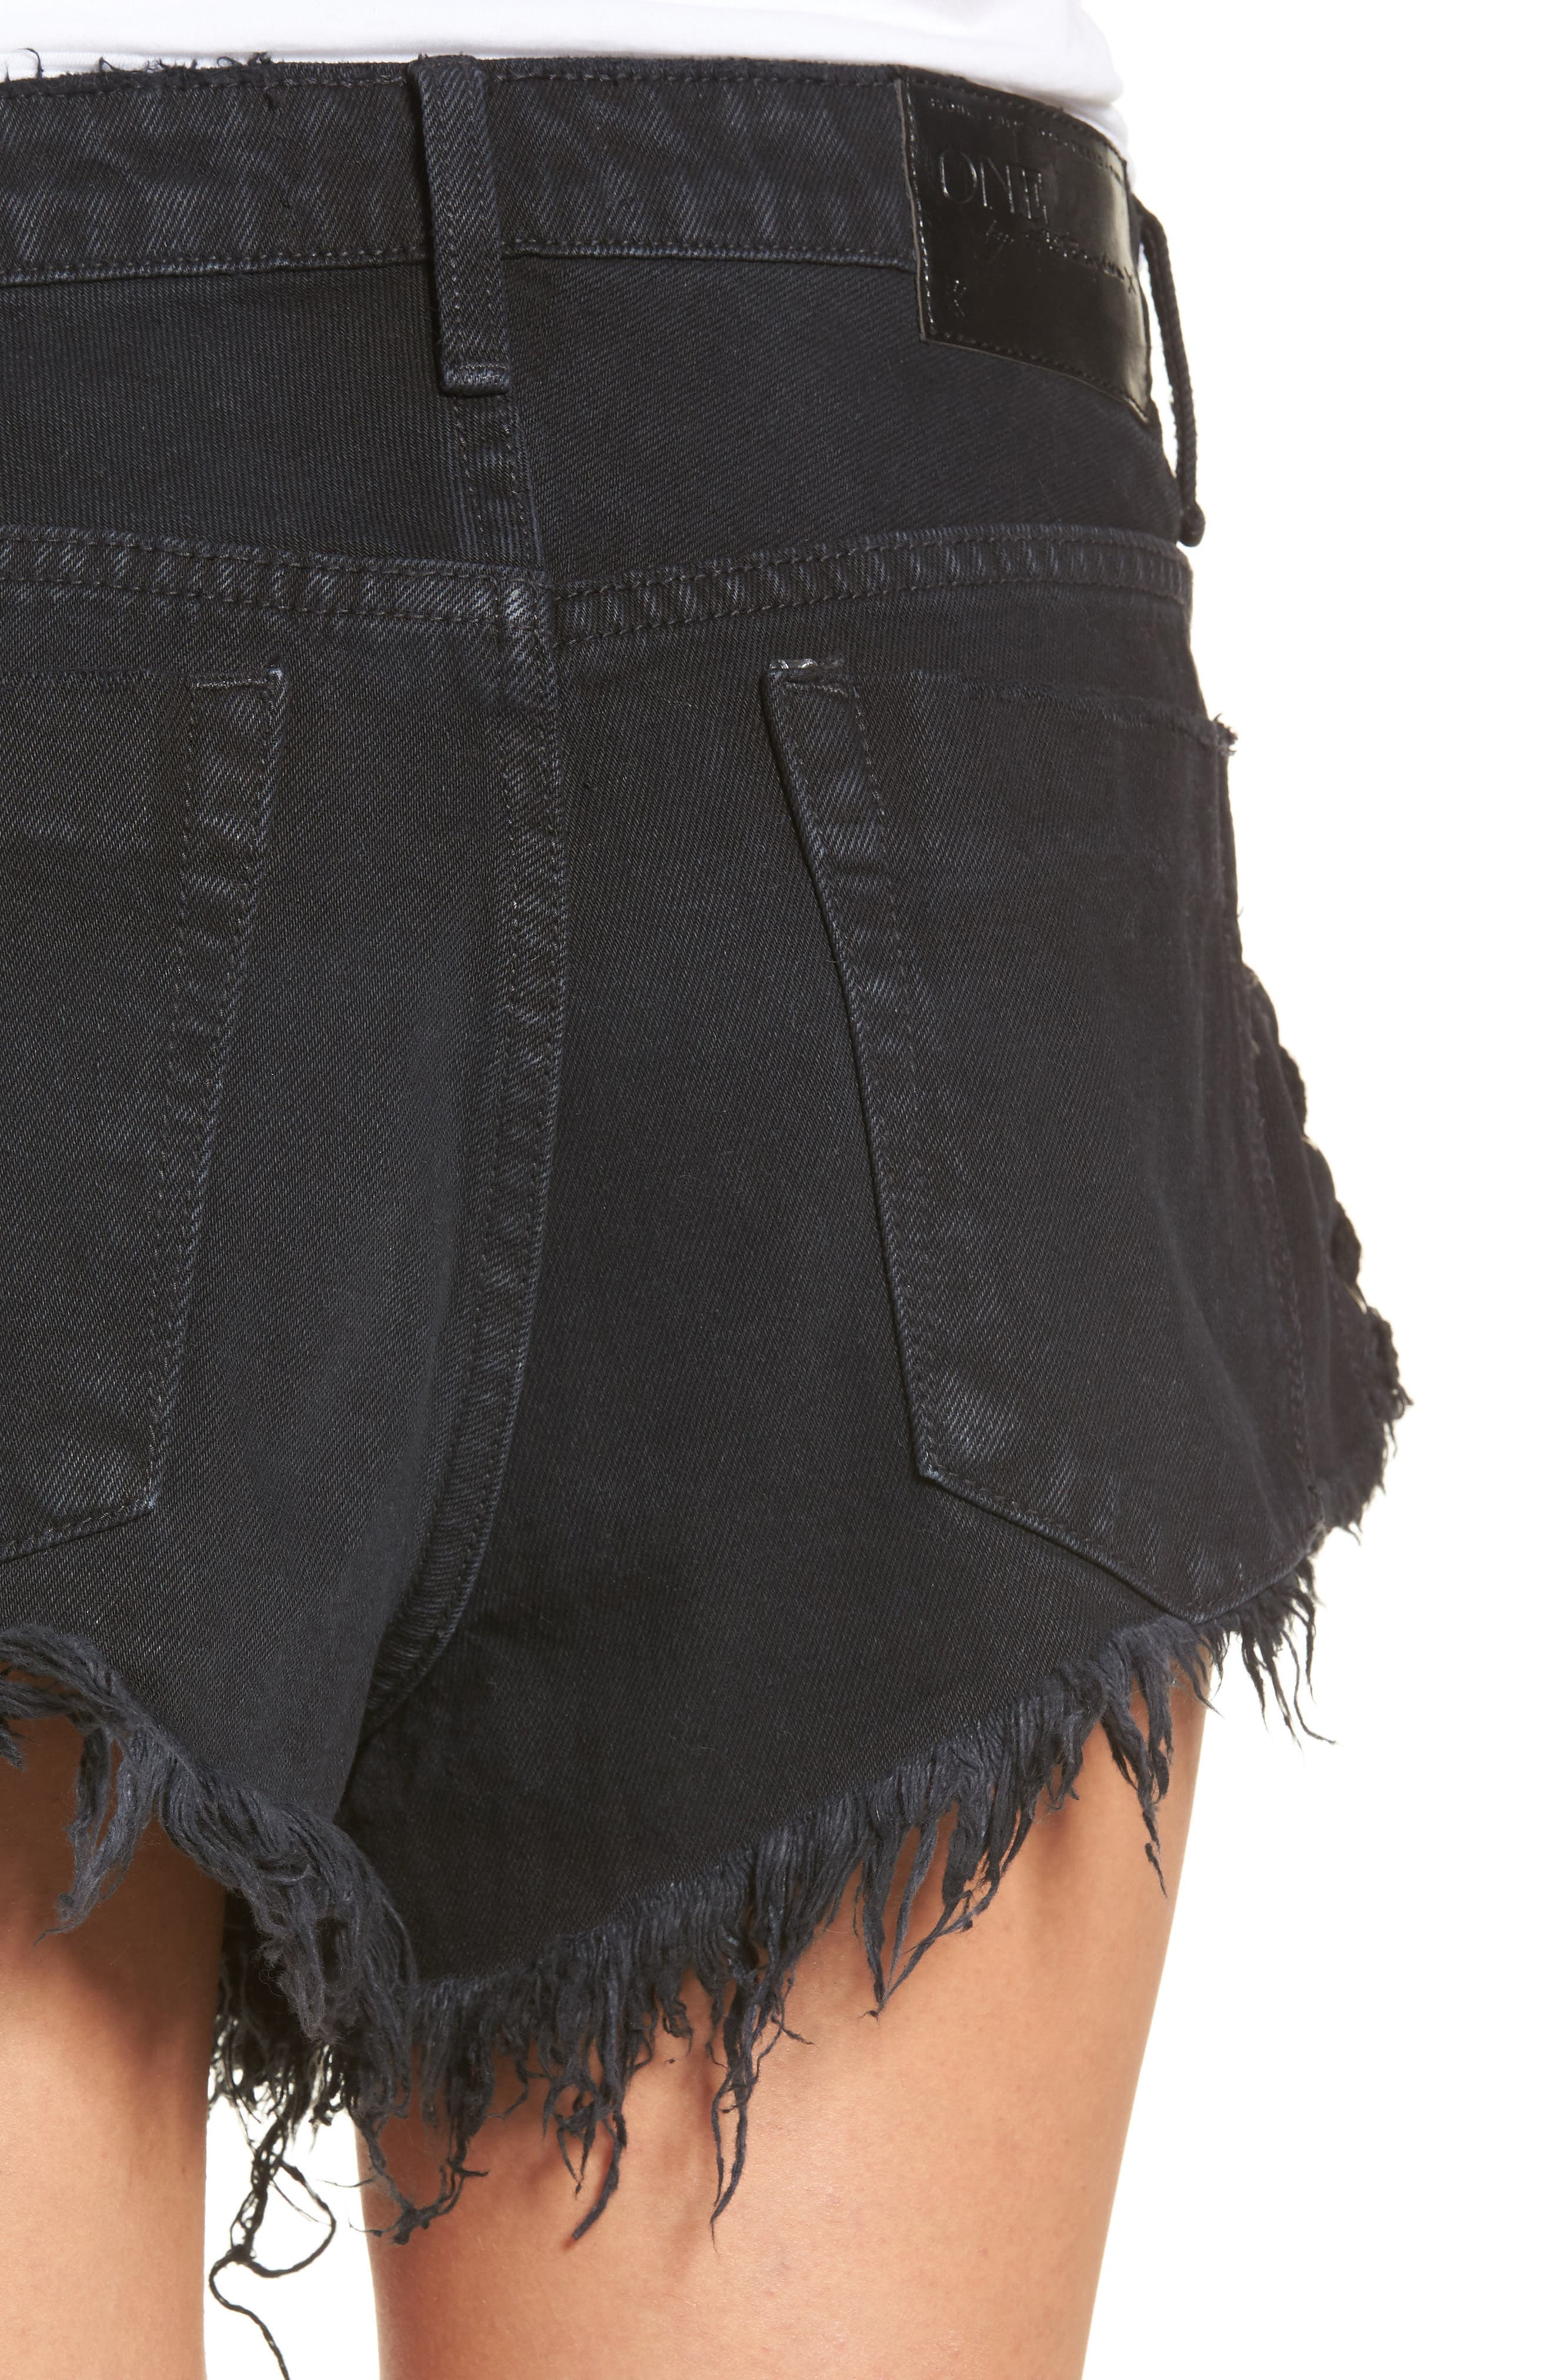 Brandos Relaxed Fit Cutoff Denim Shorts,                             Alternate thumbnail 4, color,